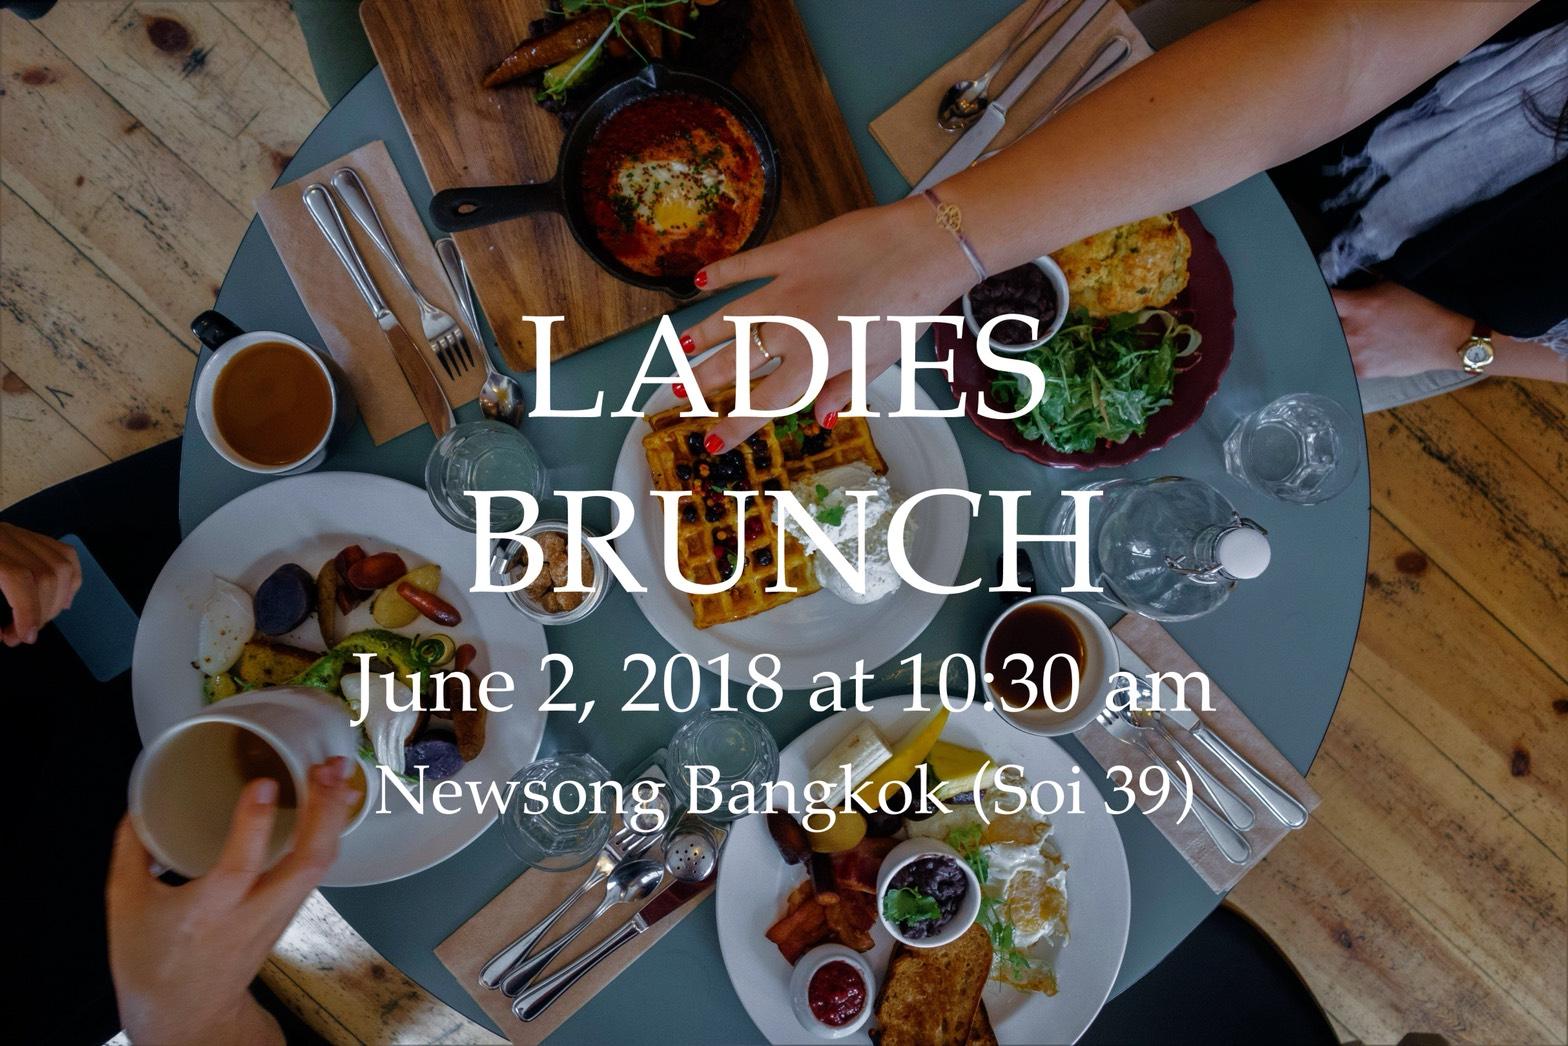 Ladies Brunch – June 2, 2018